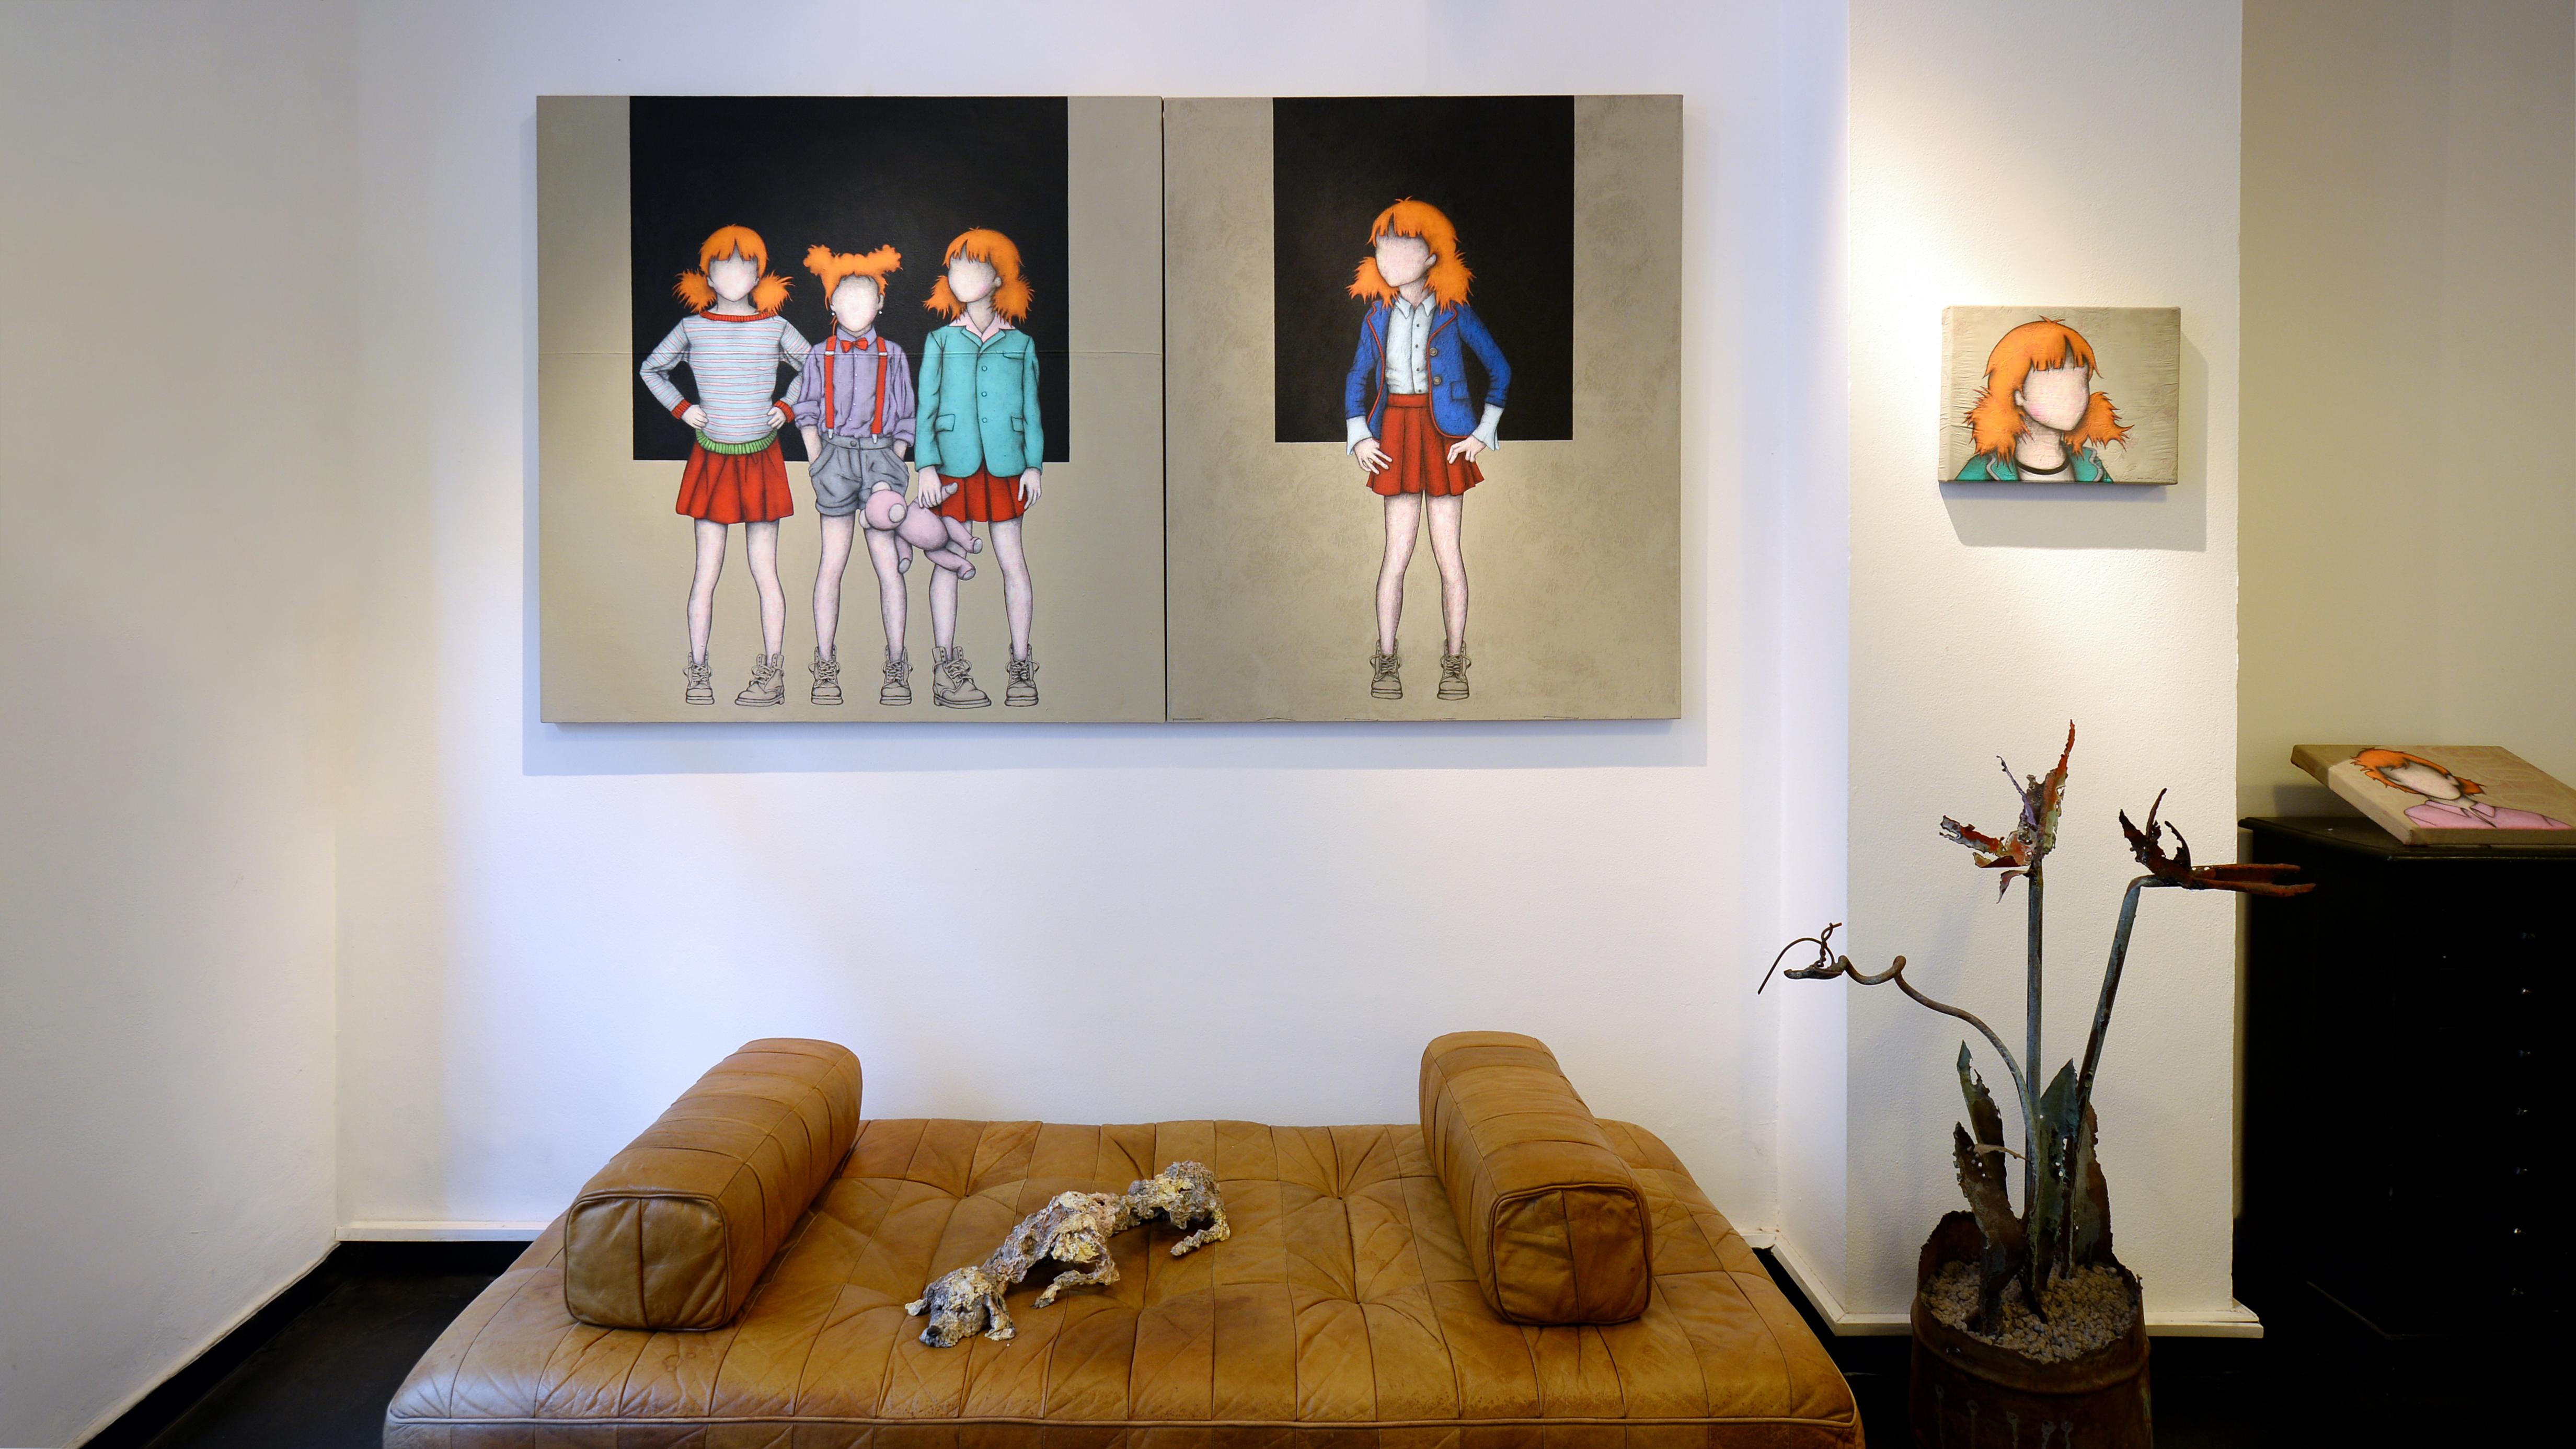 Roberto Fantini, RvB Arts art gallery